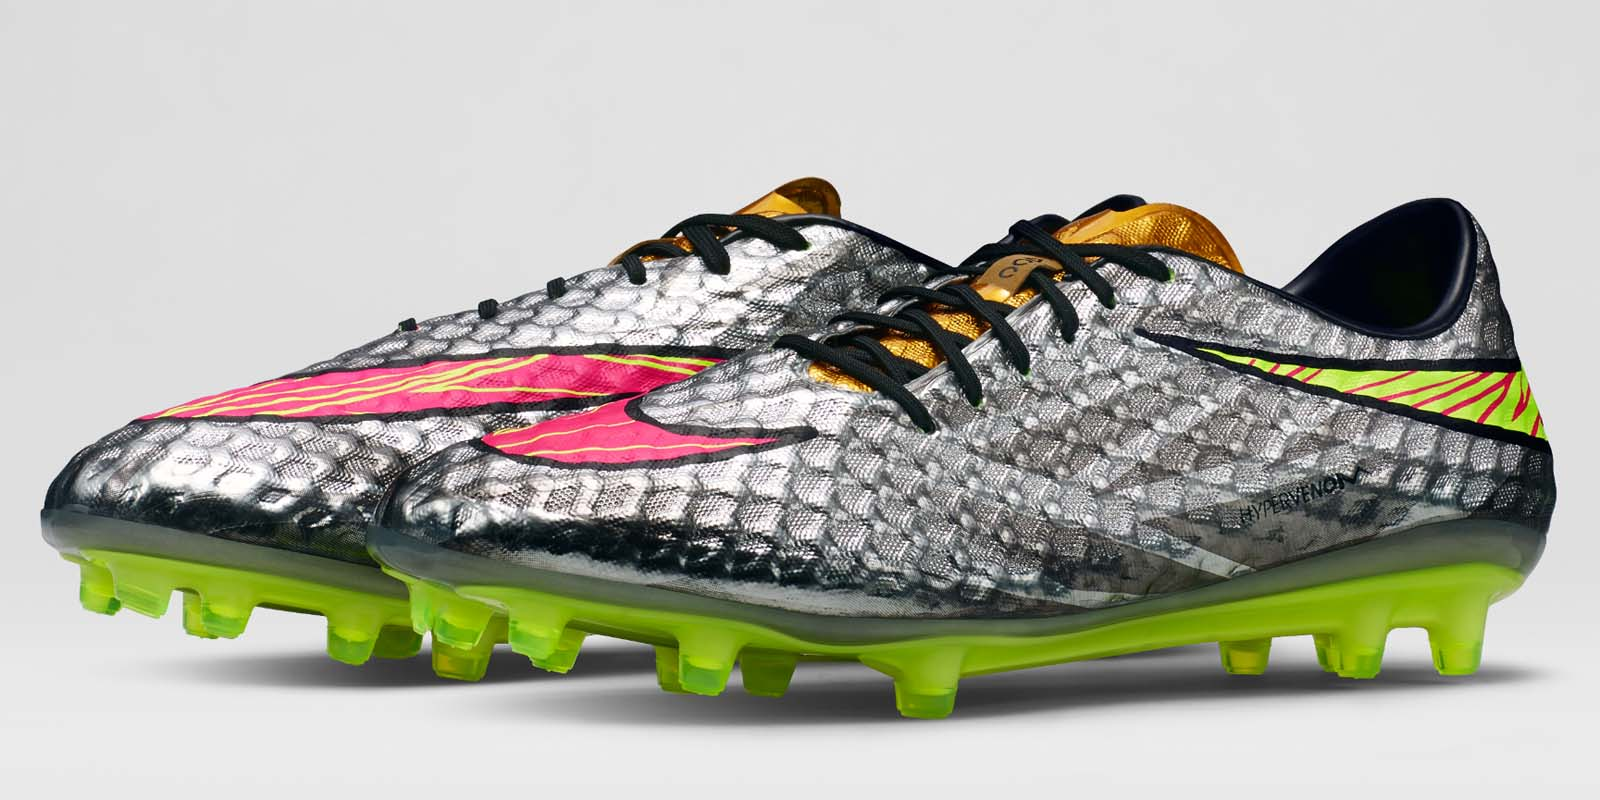 promo code for silver neymar nike hypervenom boots 1aebb 63ed5 13a9154e8b3d0